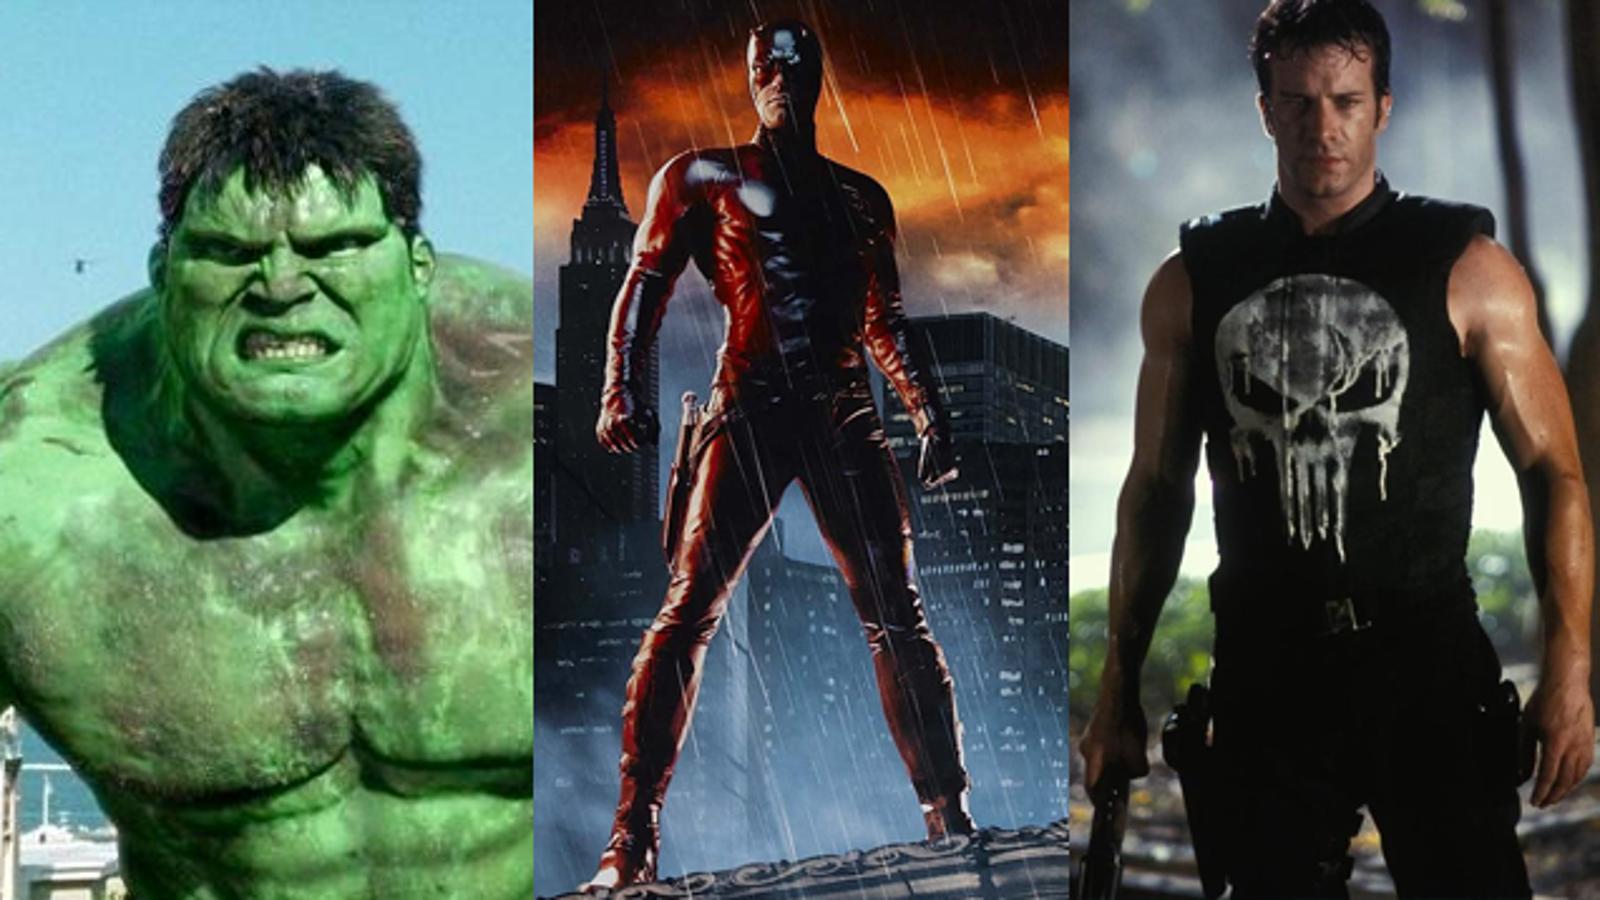 The Complete History Of Marvel Superhero Movies: 1990-2008